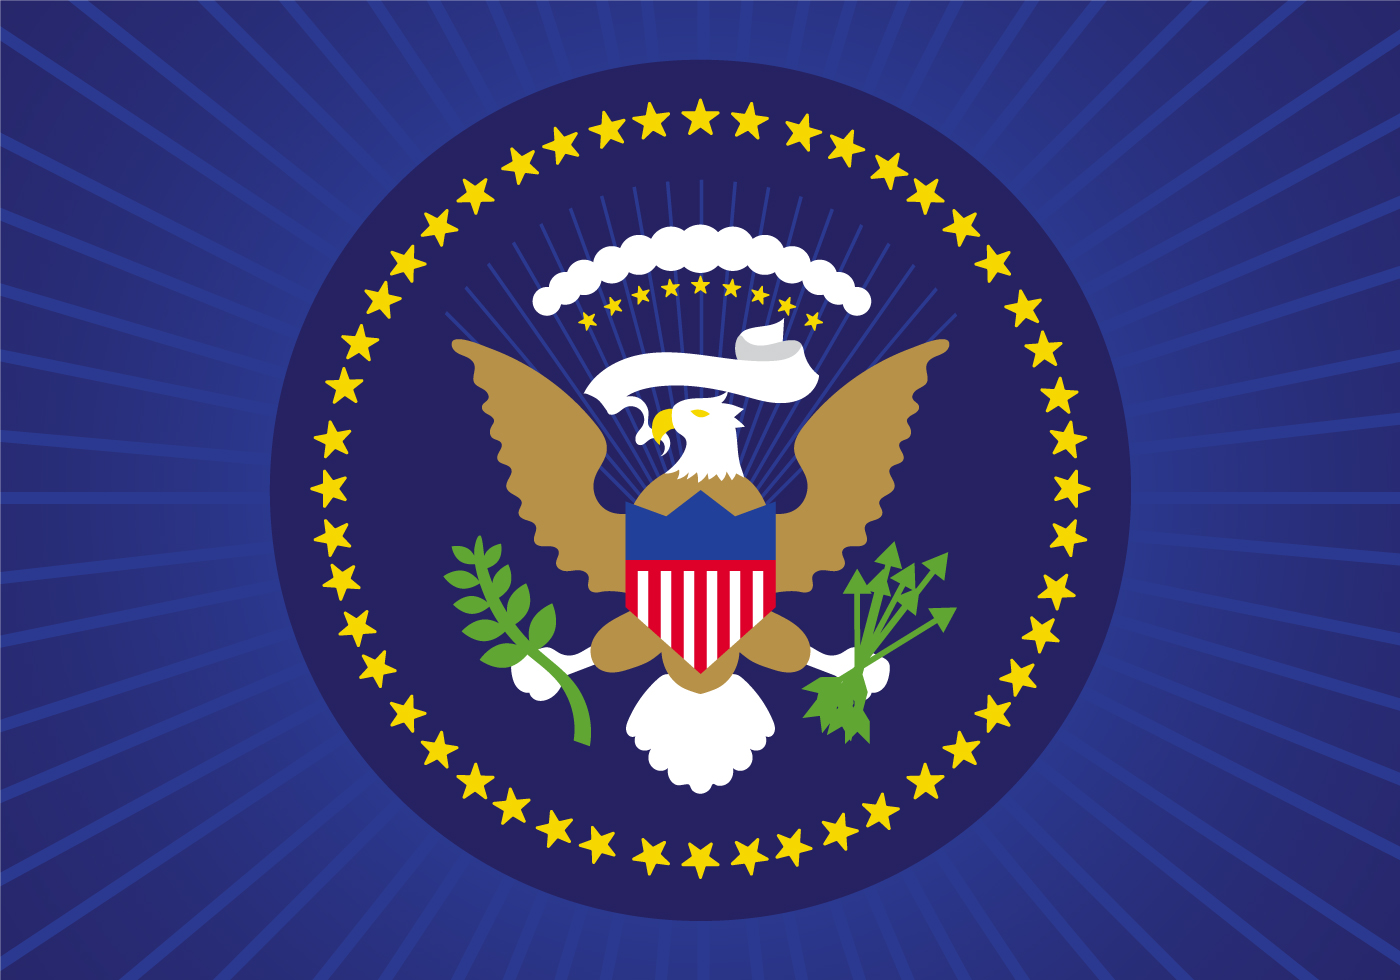 1400x980 Presidential Seal Free Vector Art